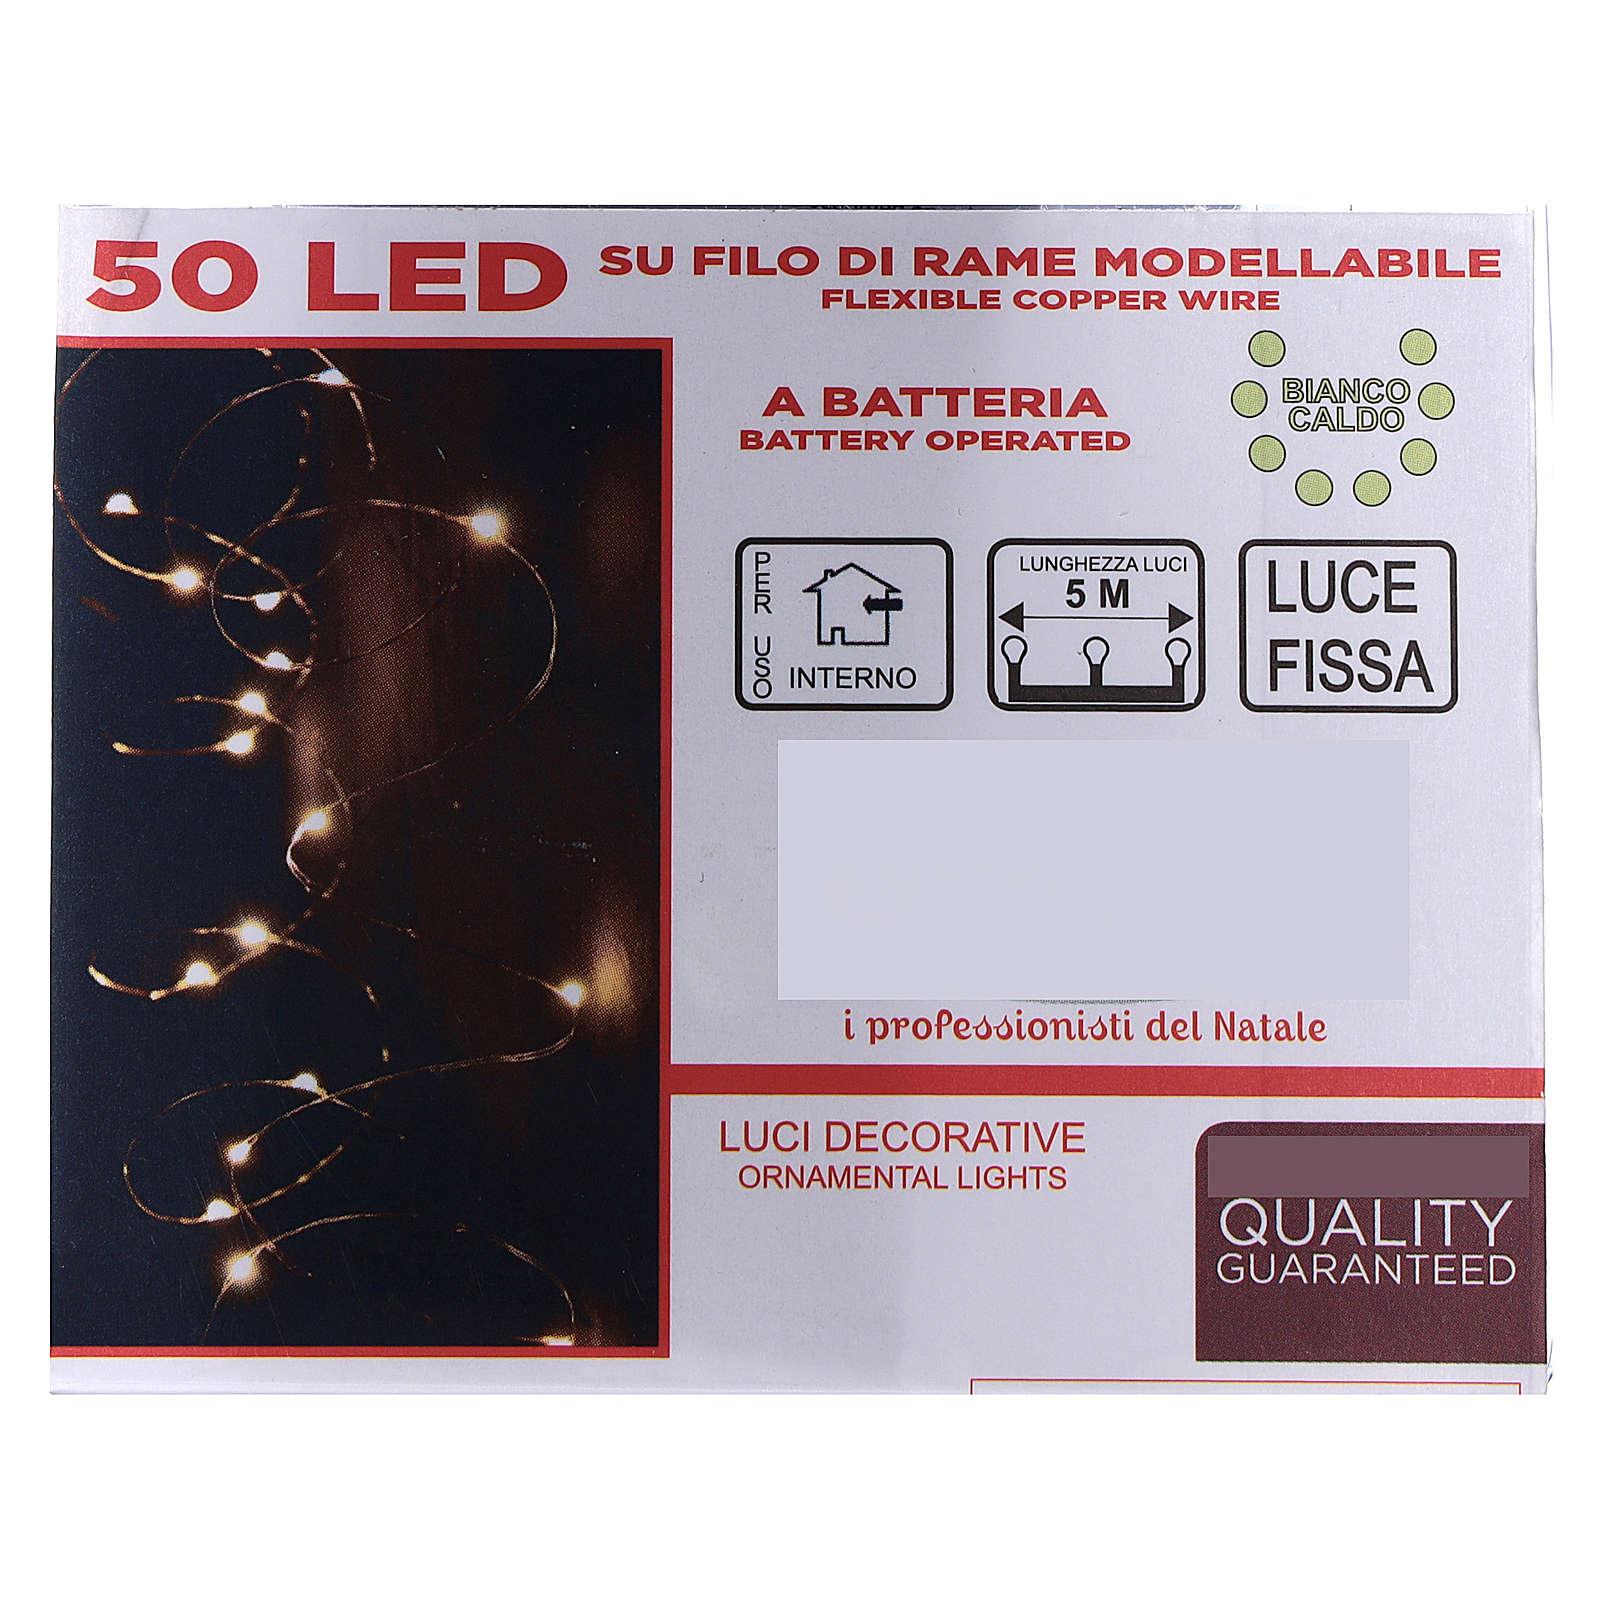 Cadena luminosa 5 m con batería 50 gotas led blanco cálido interior batería 3